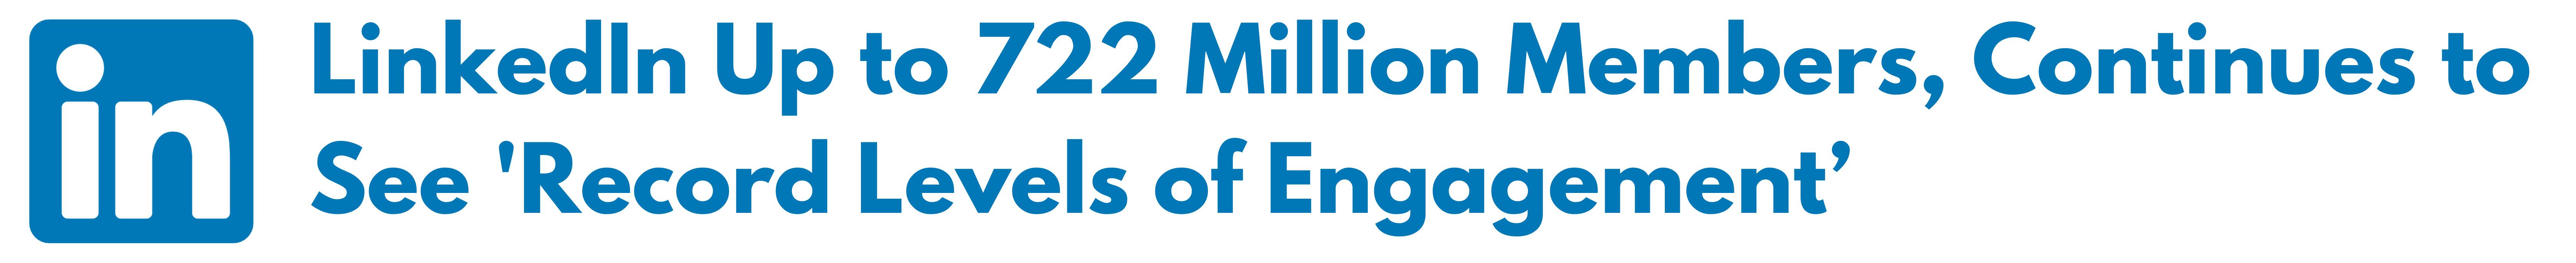 LinkedIn up to 722 million members